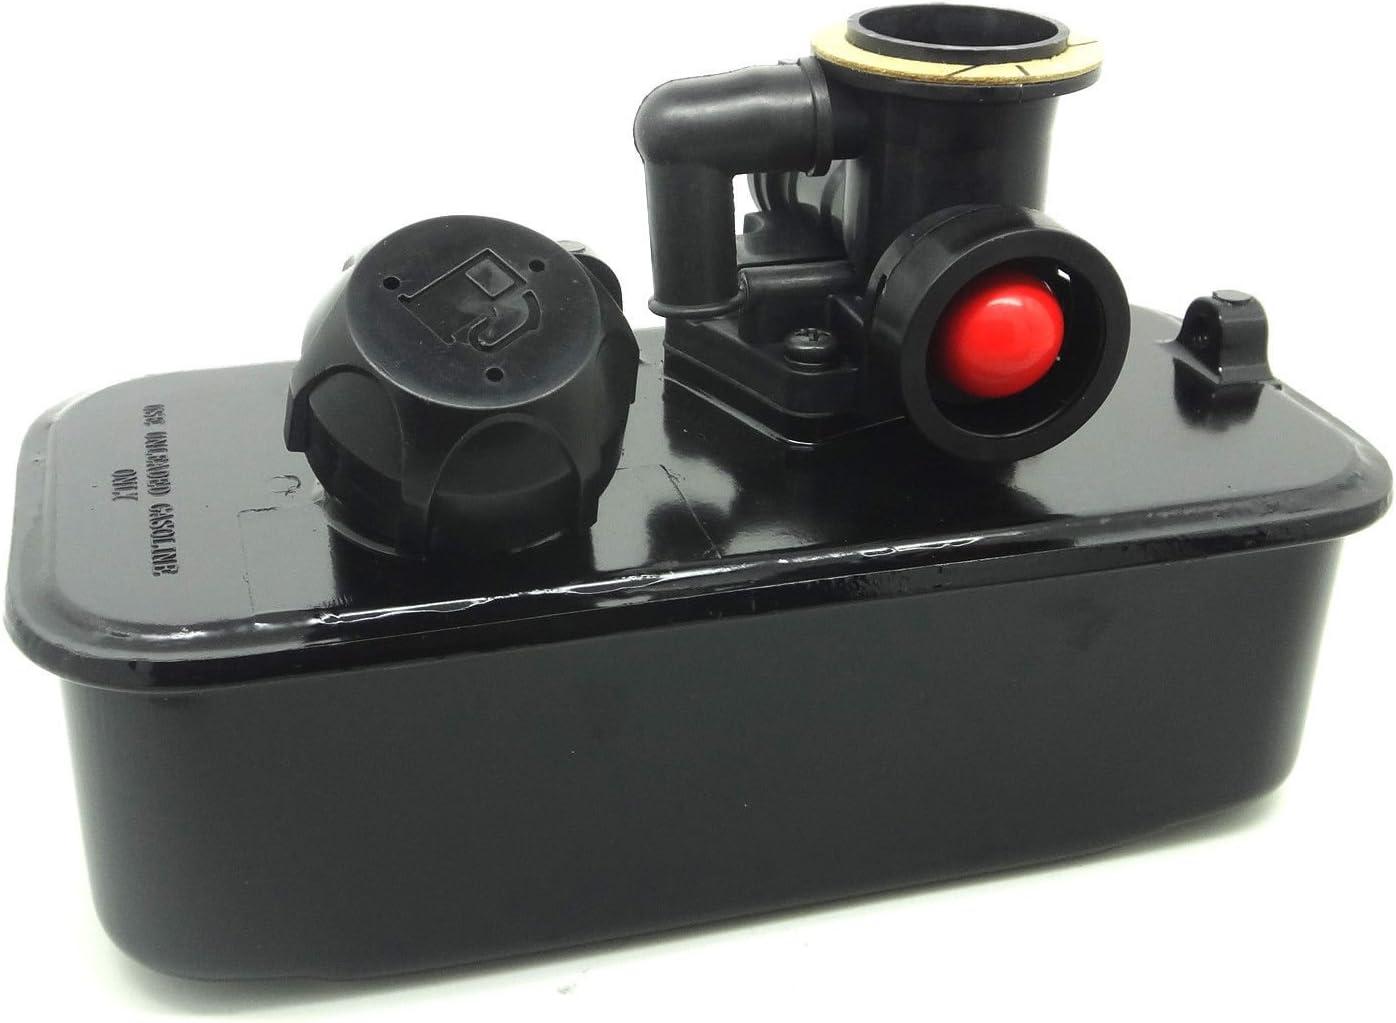 ConPus 494406 Fuel Tank and 795477 Carburetor for Briggs & Stratton 498809 498809A 795469 794147 699660 794161 498811 Carb